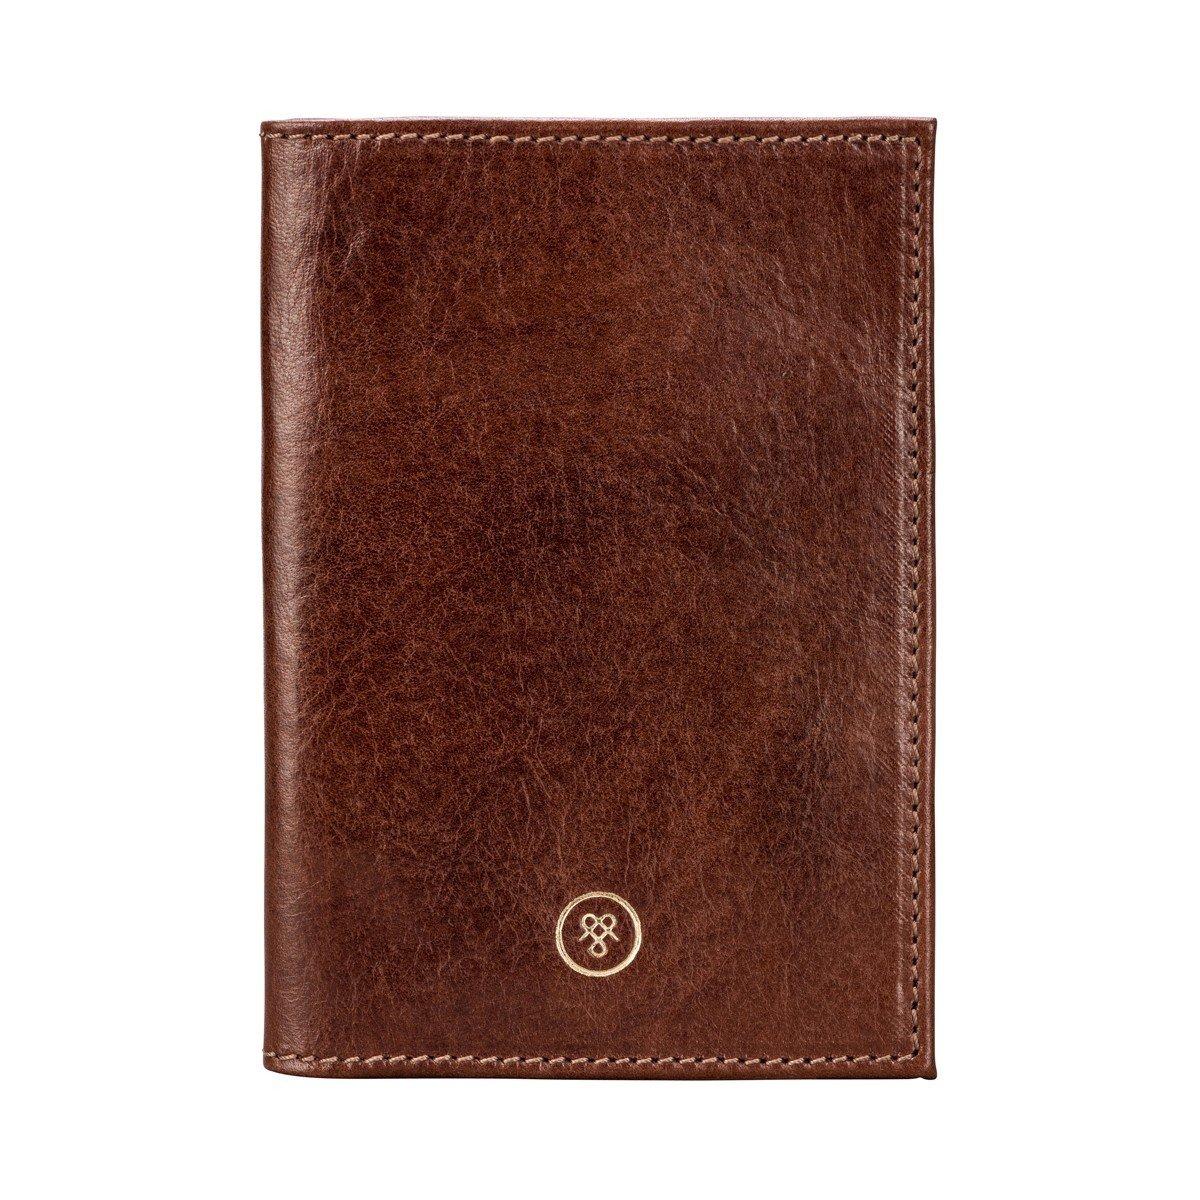 Maxwell Scott Personalized Luxury Handcrafted Italian Full Grain Leather Passport Cover / Holder (The Prato)